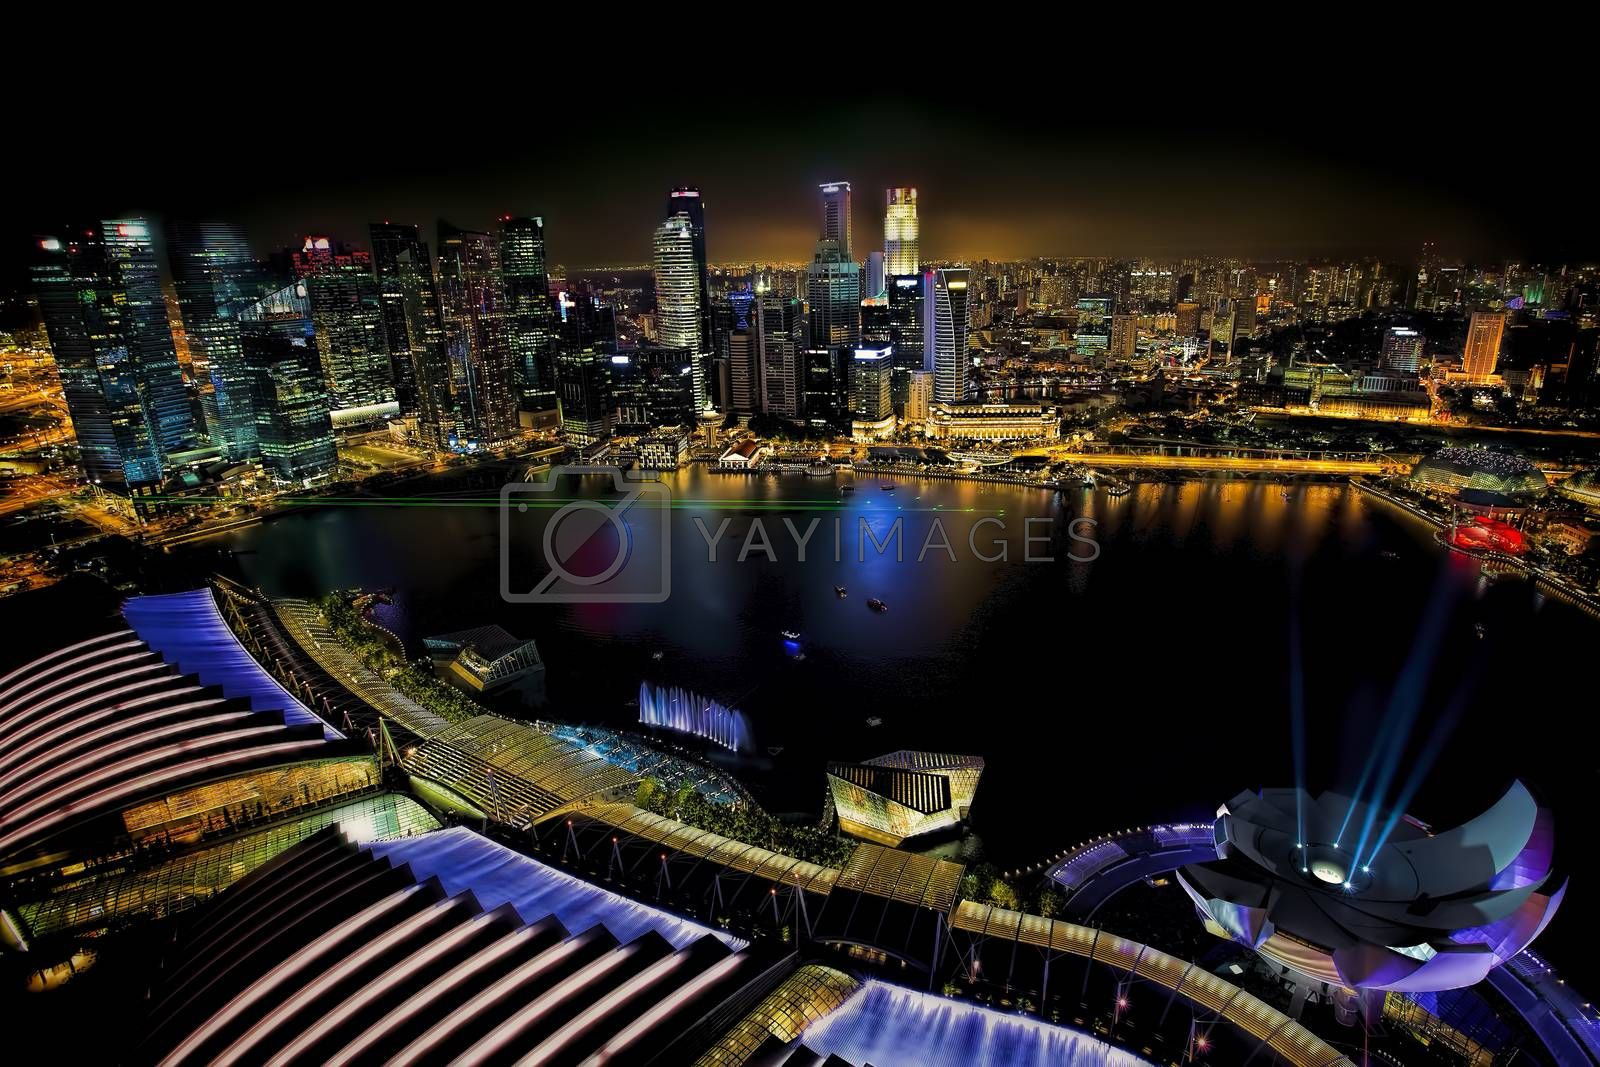 Royalty free image of Singapore Skyline by kjorgen